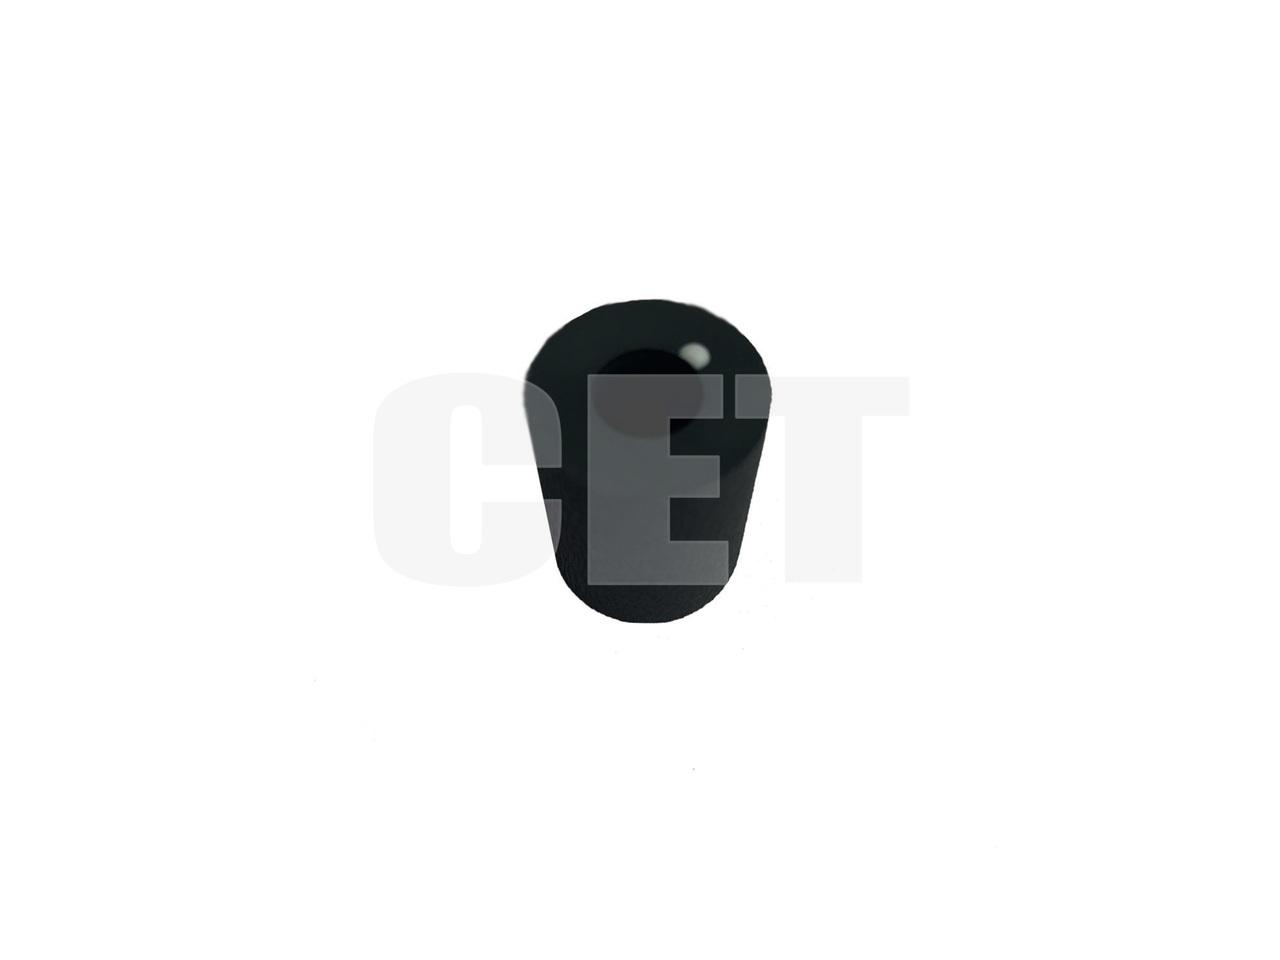 Резинка ролика подхвата 2F906230, 2F906240 для KYOCERAFS-1028MFP/1035MFP/1128MFP/1135MFP/4000DN/4020DN(CET), CET4398BPT